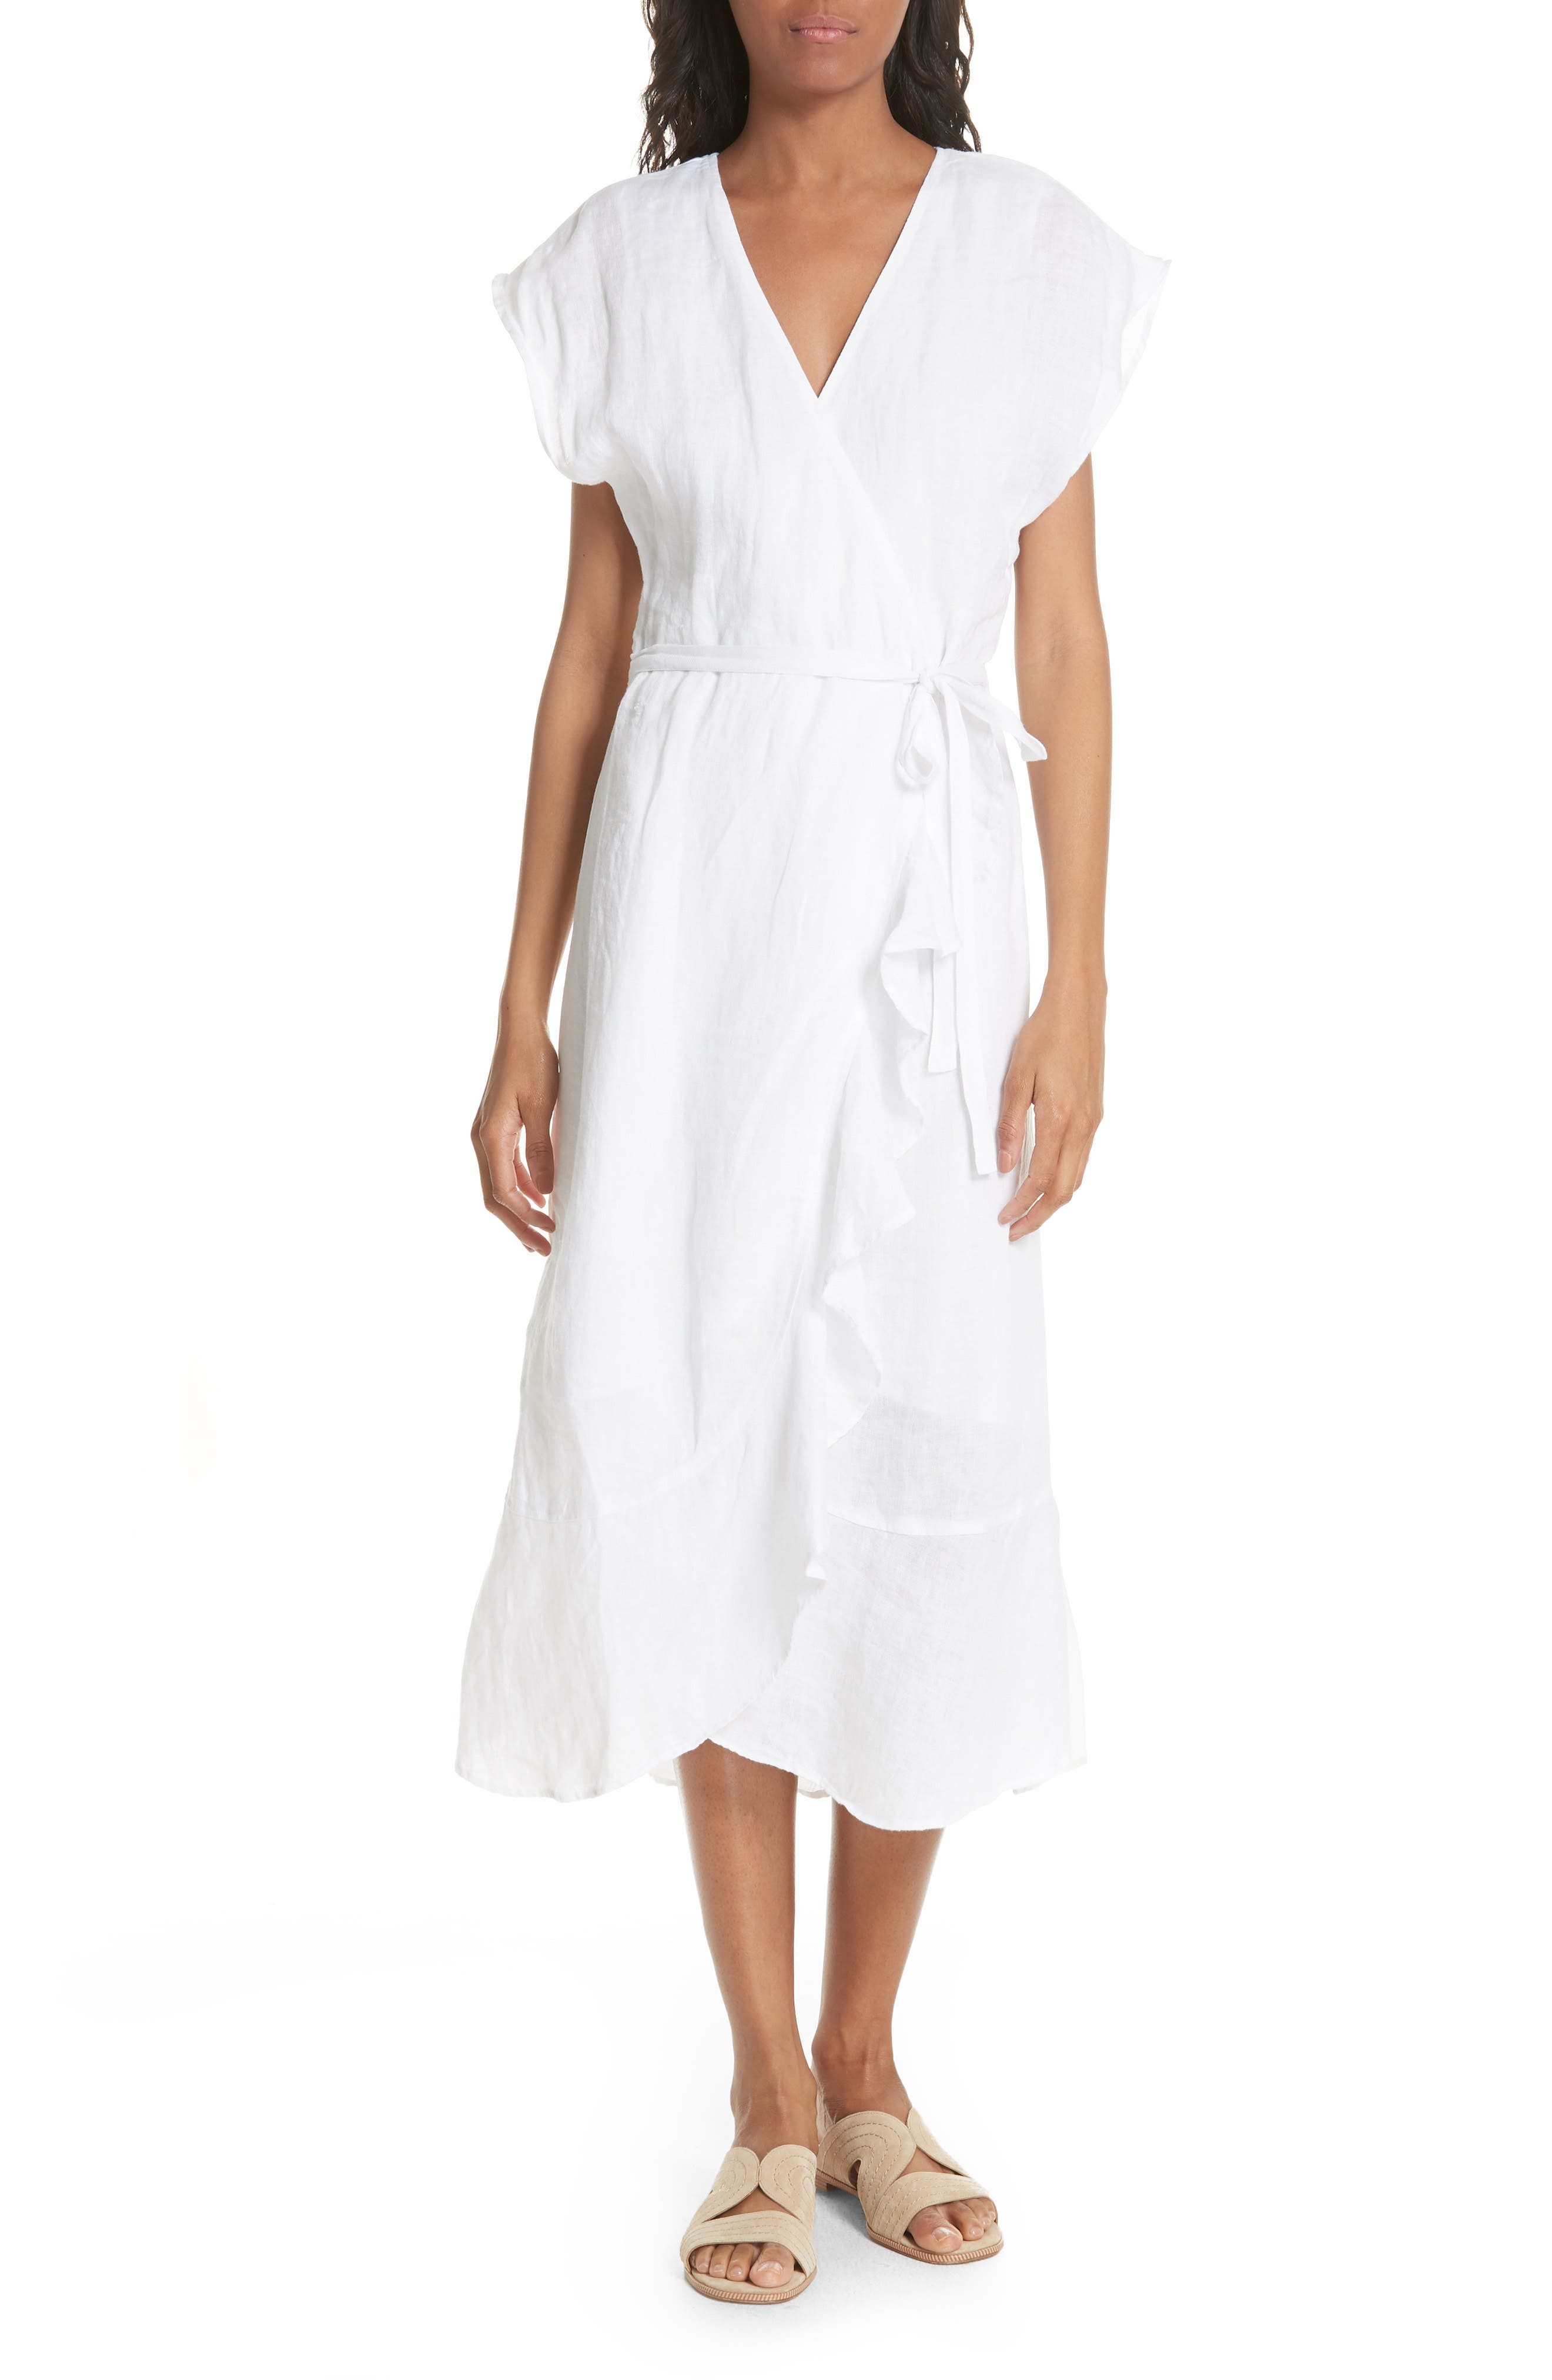 Filma Back Cutout Linen Wrap Dress,                             Main thumbnail 1, color,                             PORCELAIN